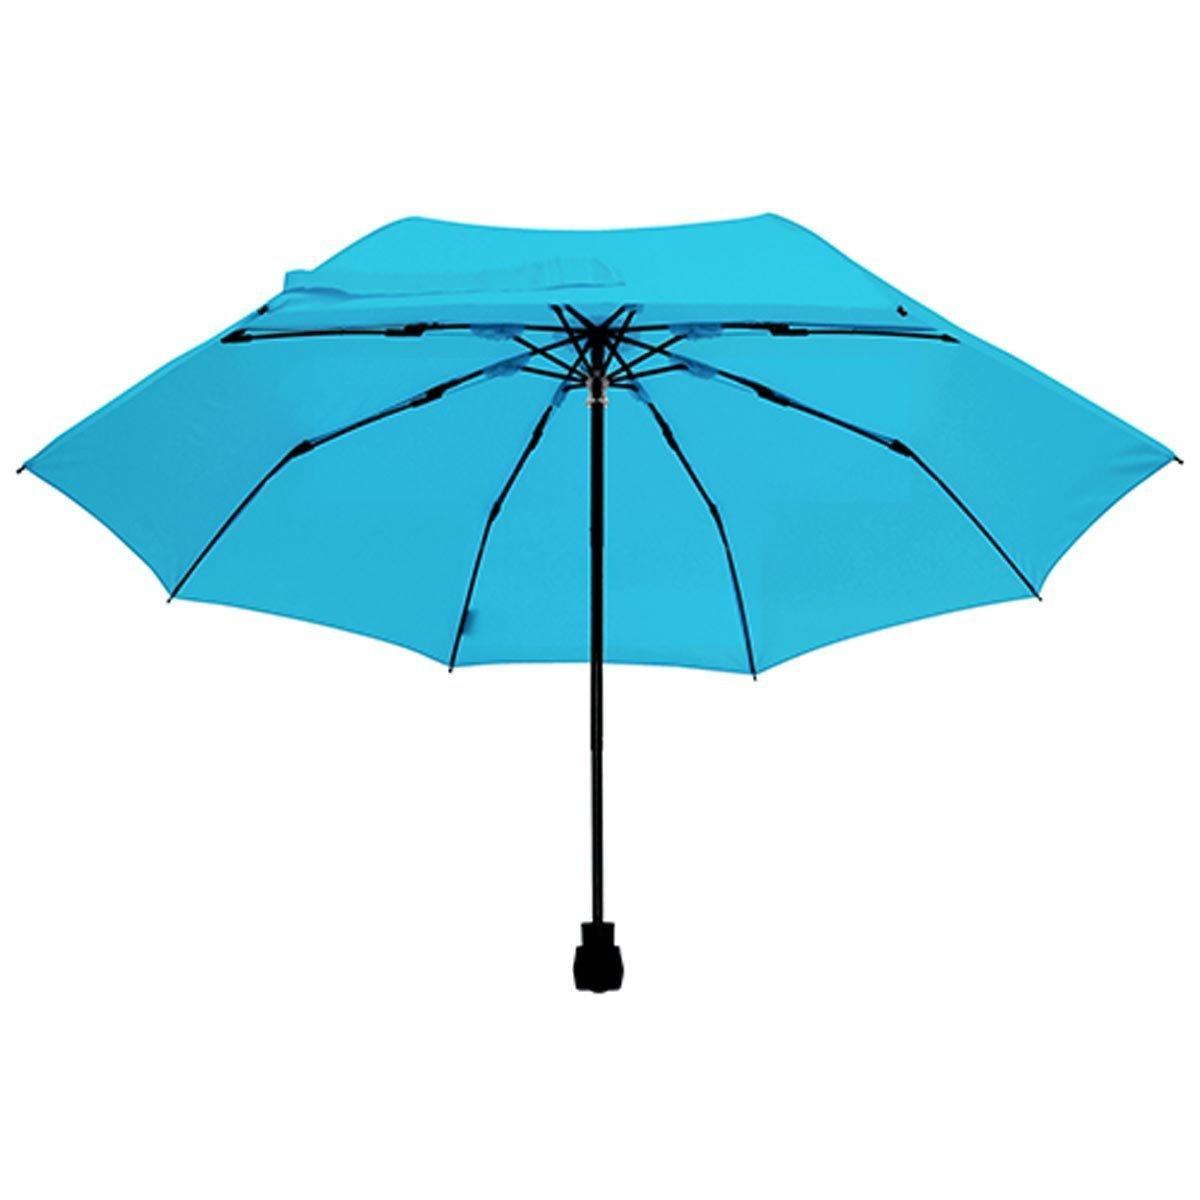 EuroSCHIRM Light Trek Umbrella (Ice Blue)